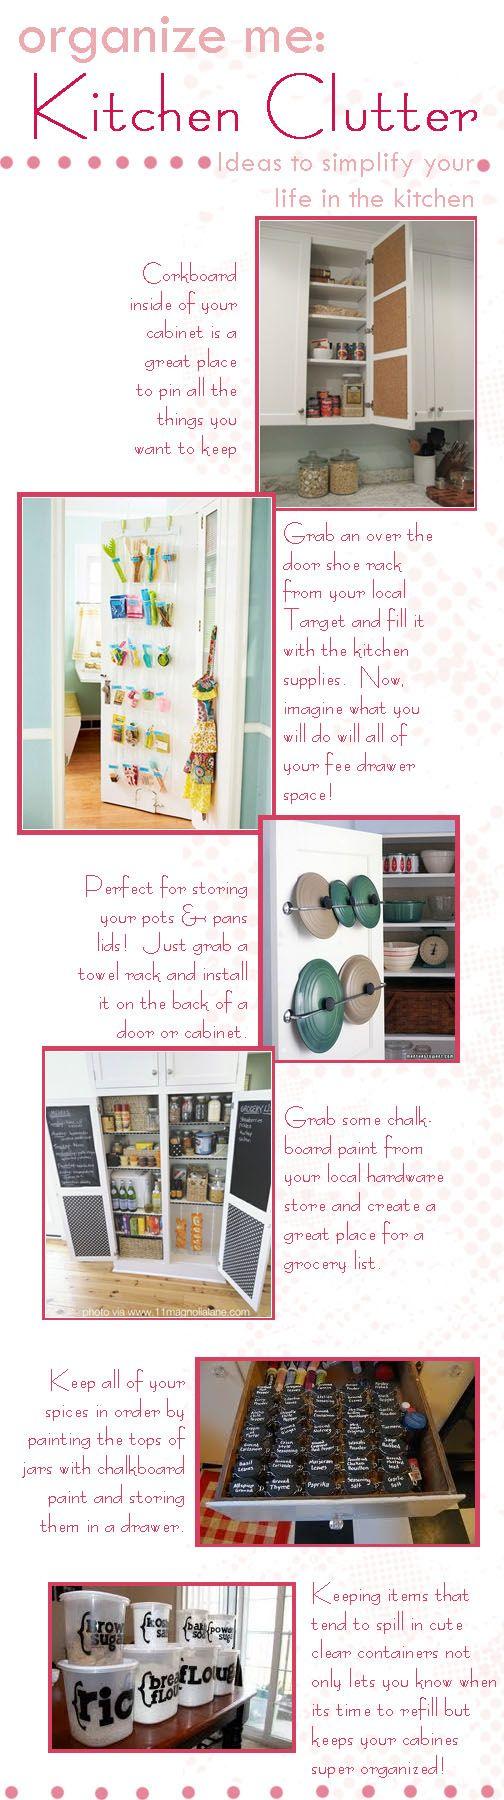 organize kitchen clutter! great tips